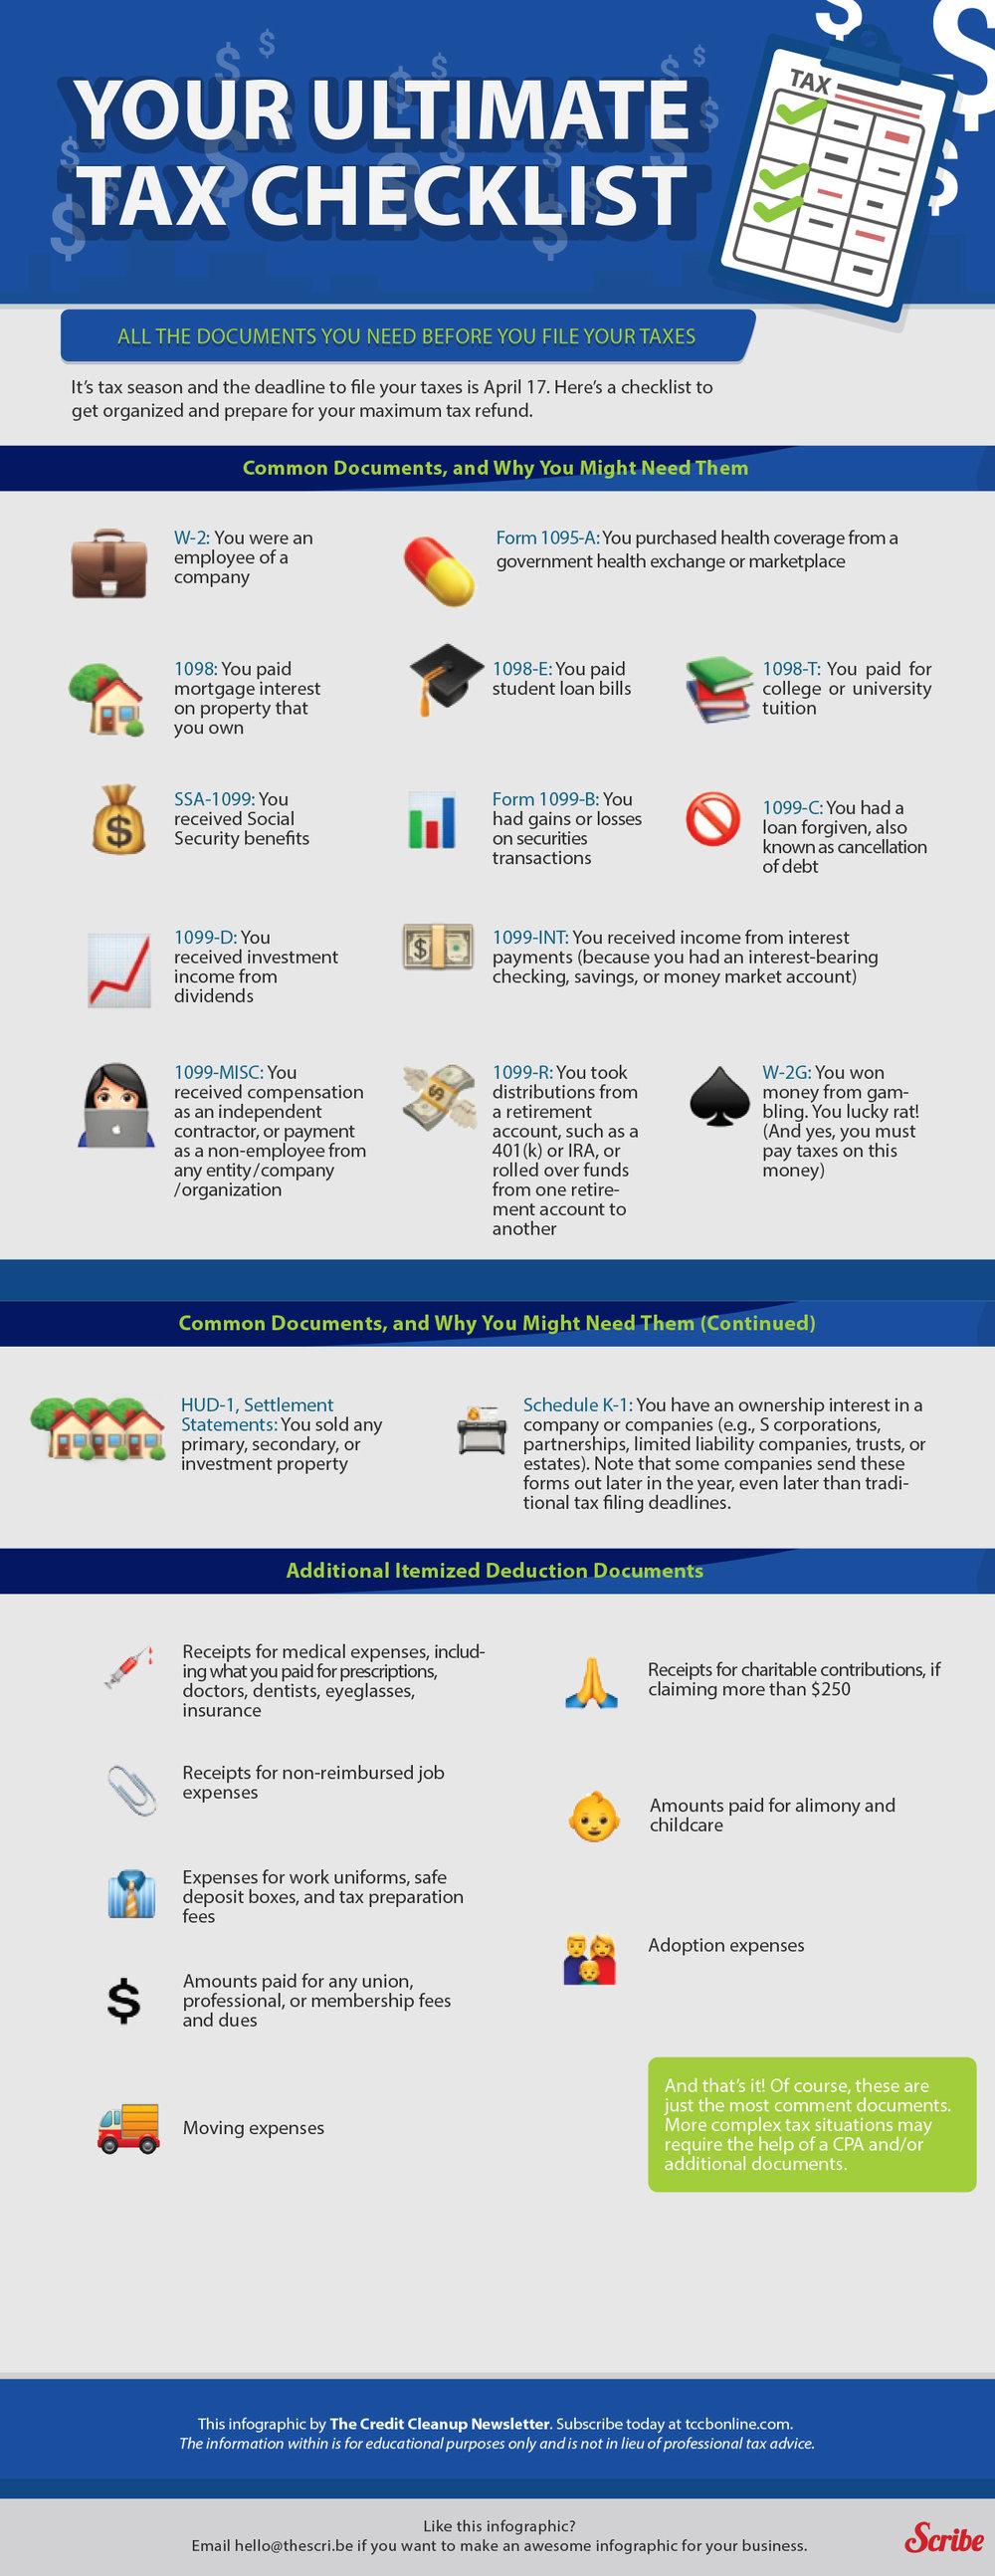 Tax-Checklist.jpg